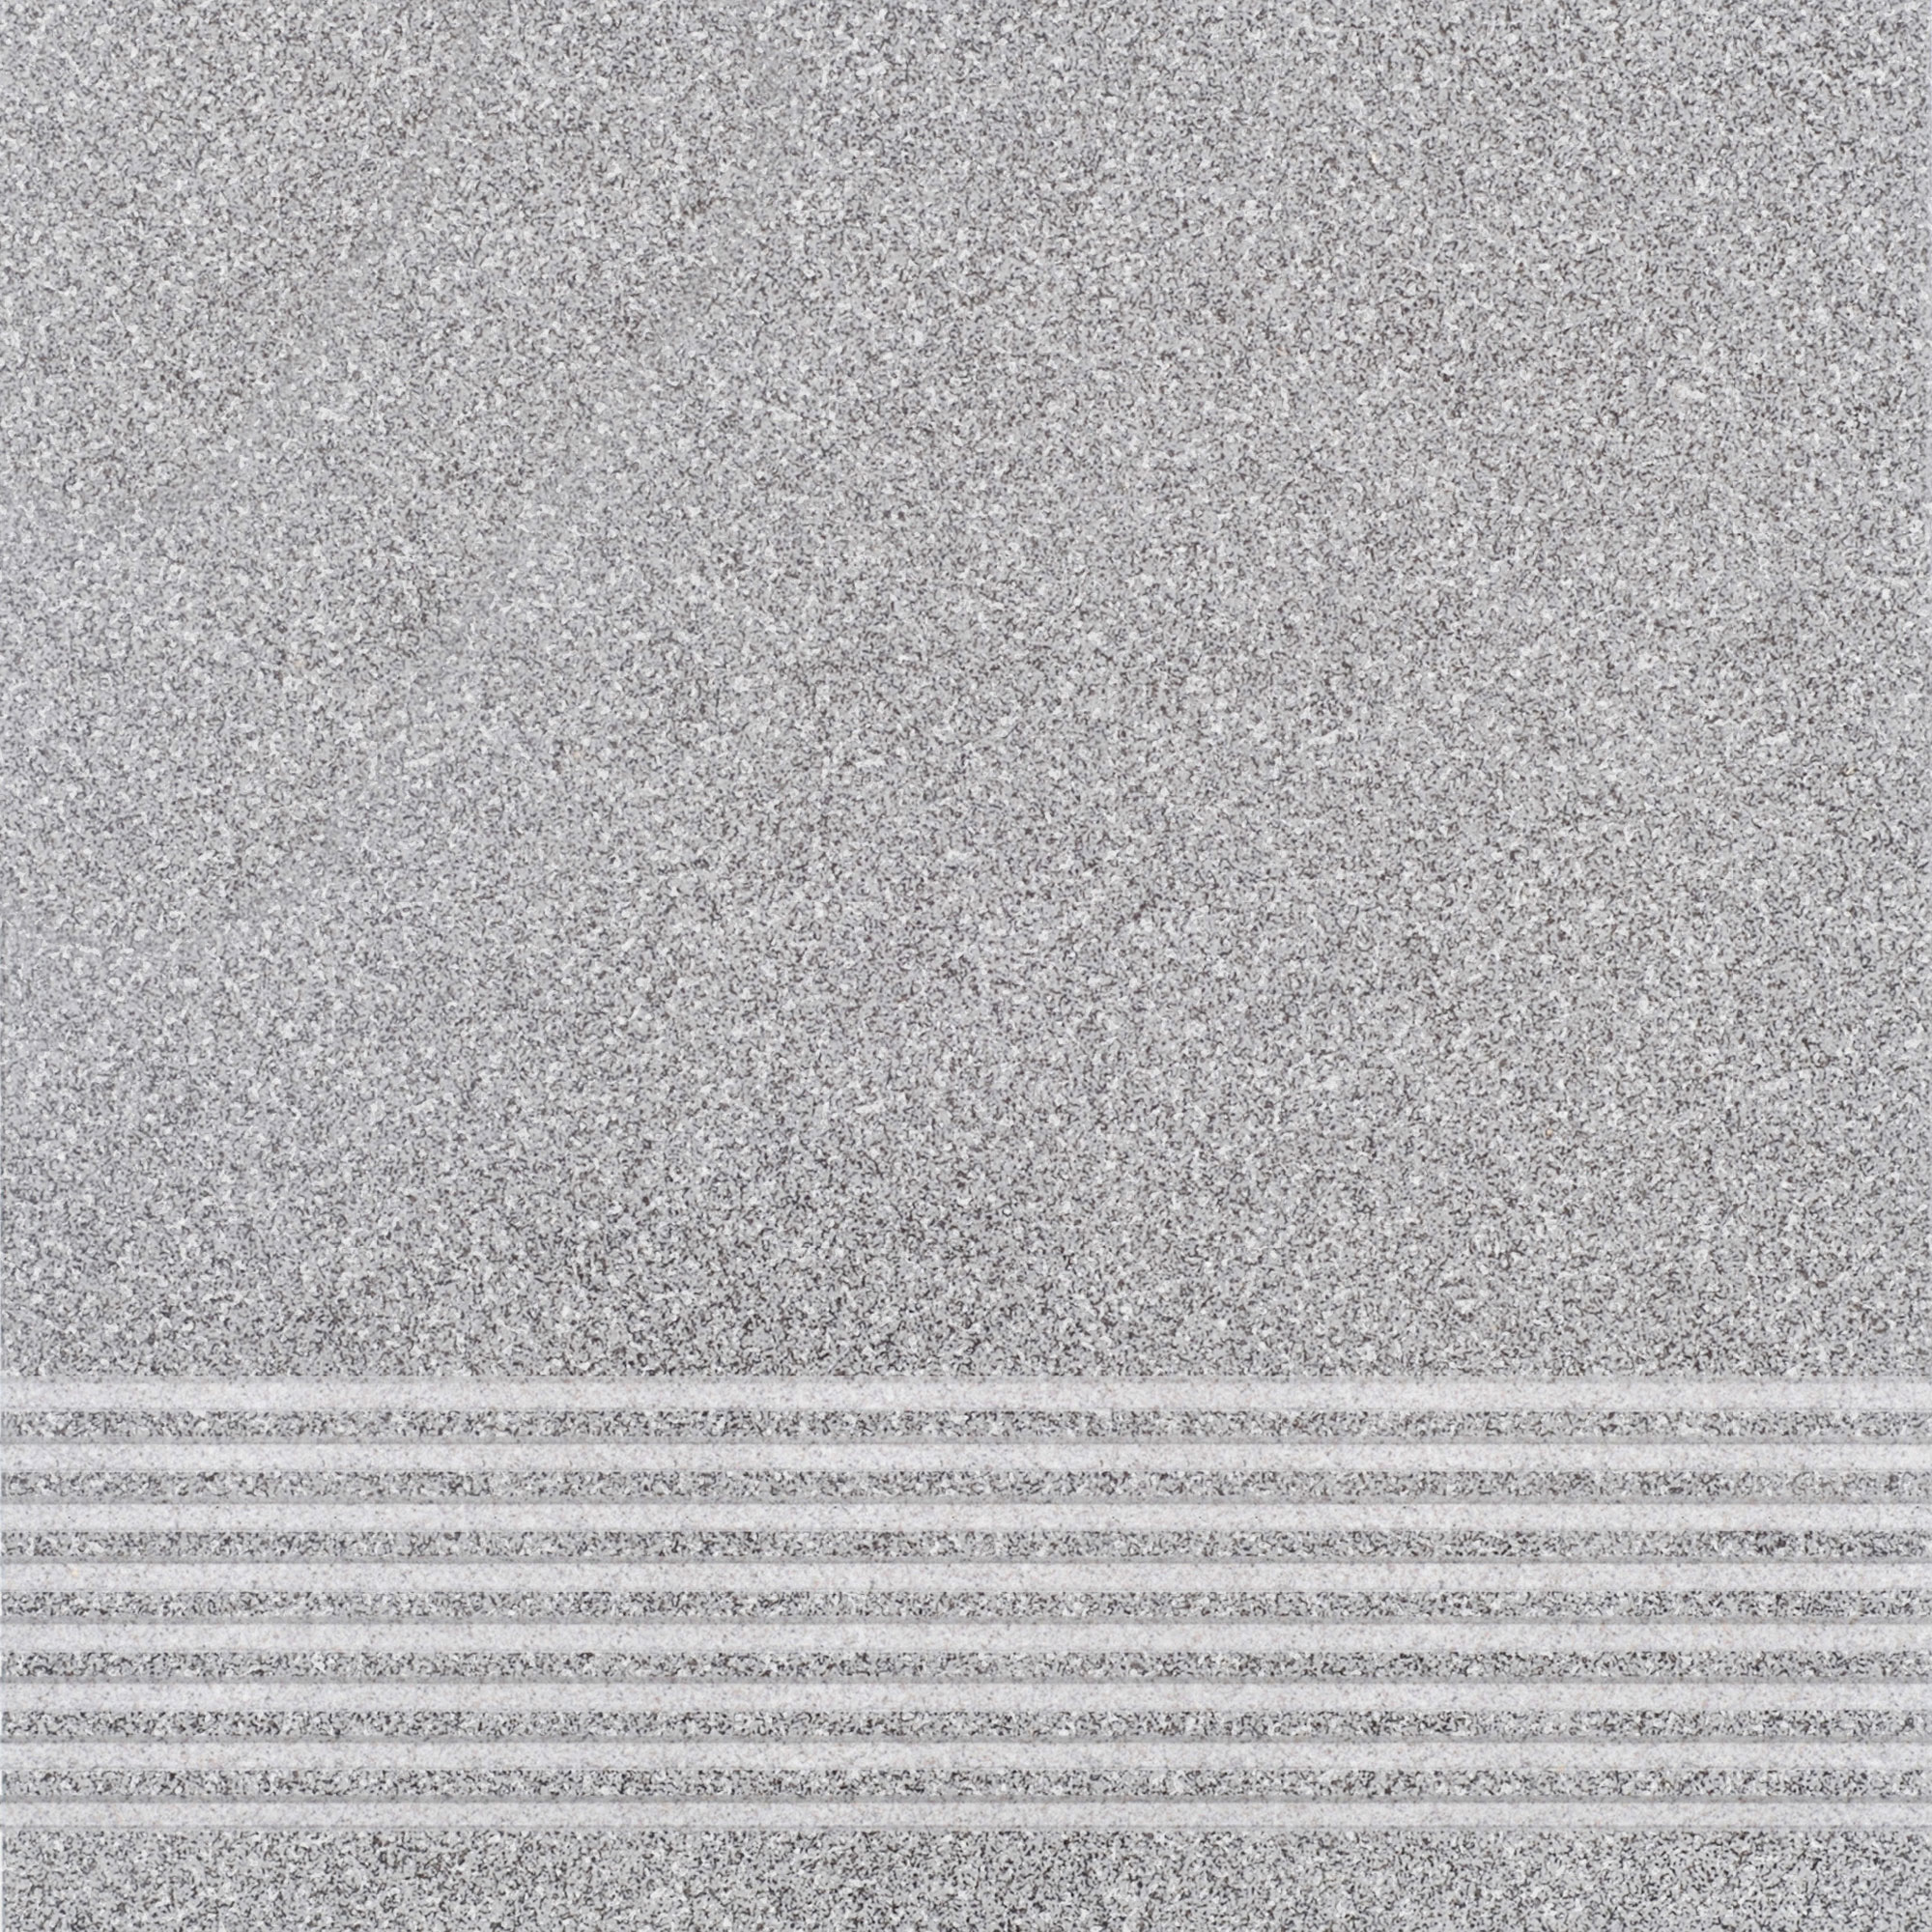 Klinker Arredo Gres Kallisto K10 Grafit 30×30 cm Trappnos